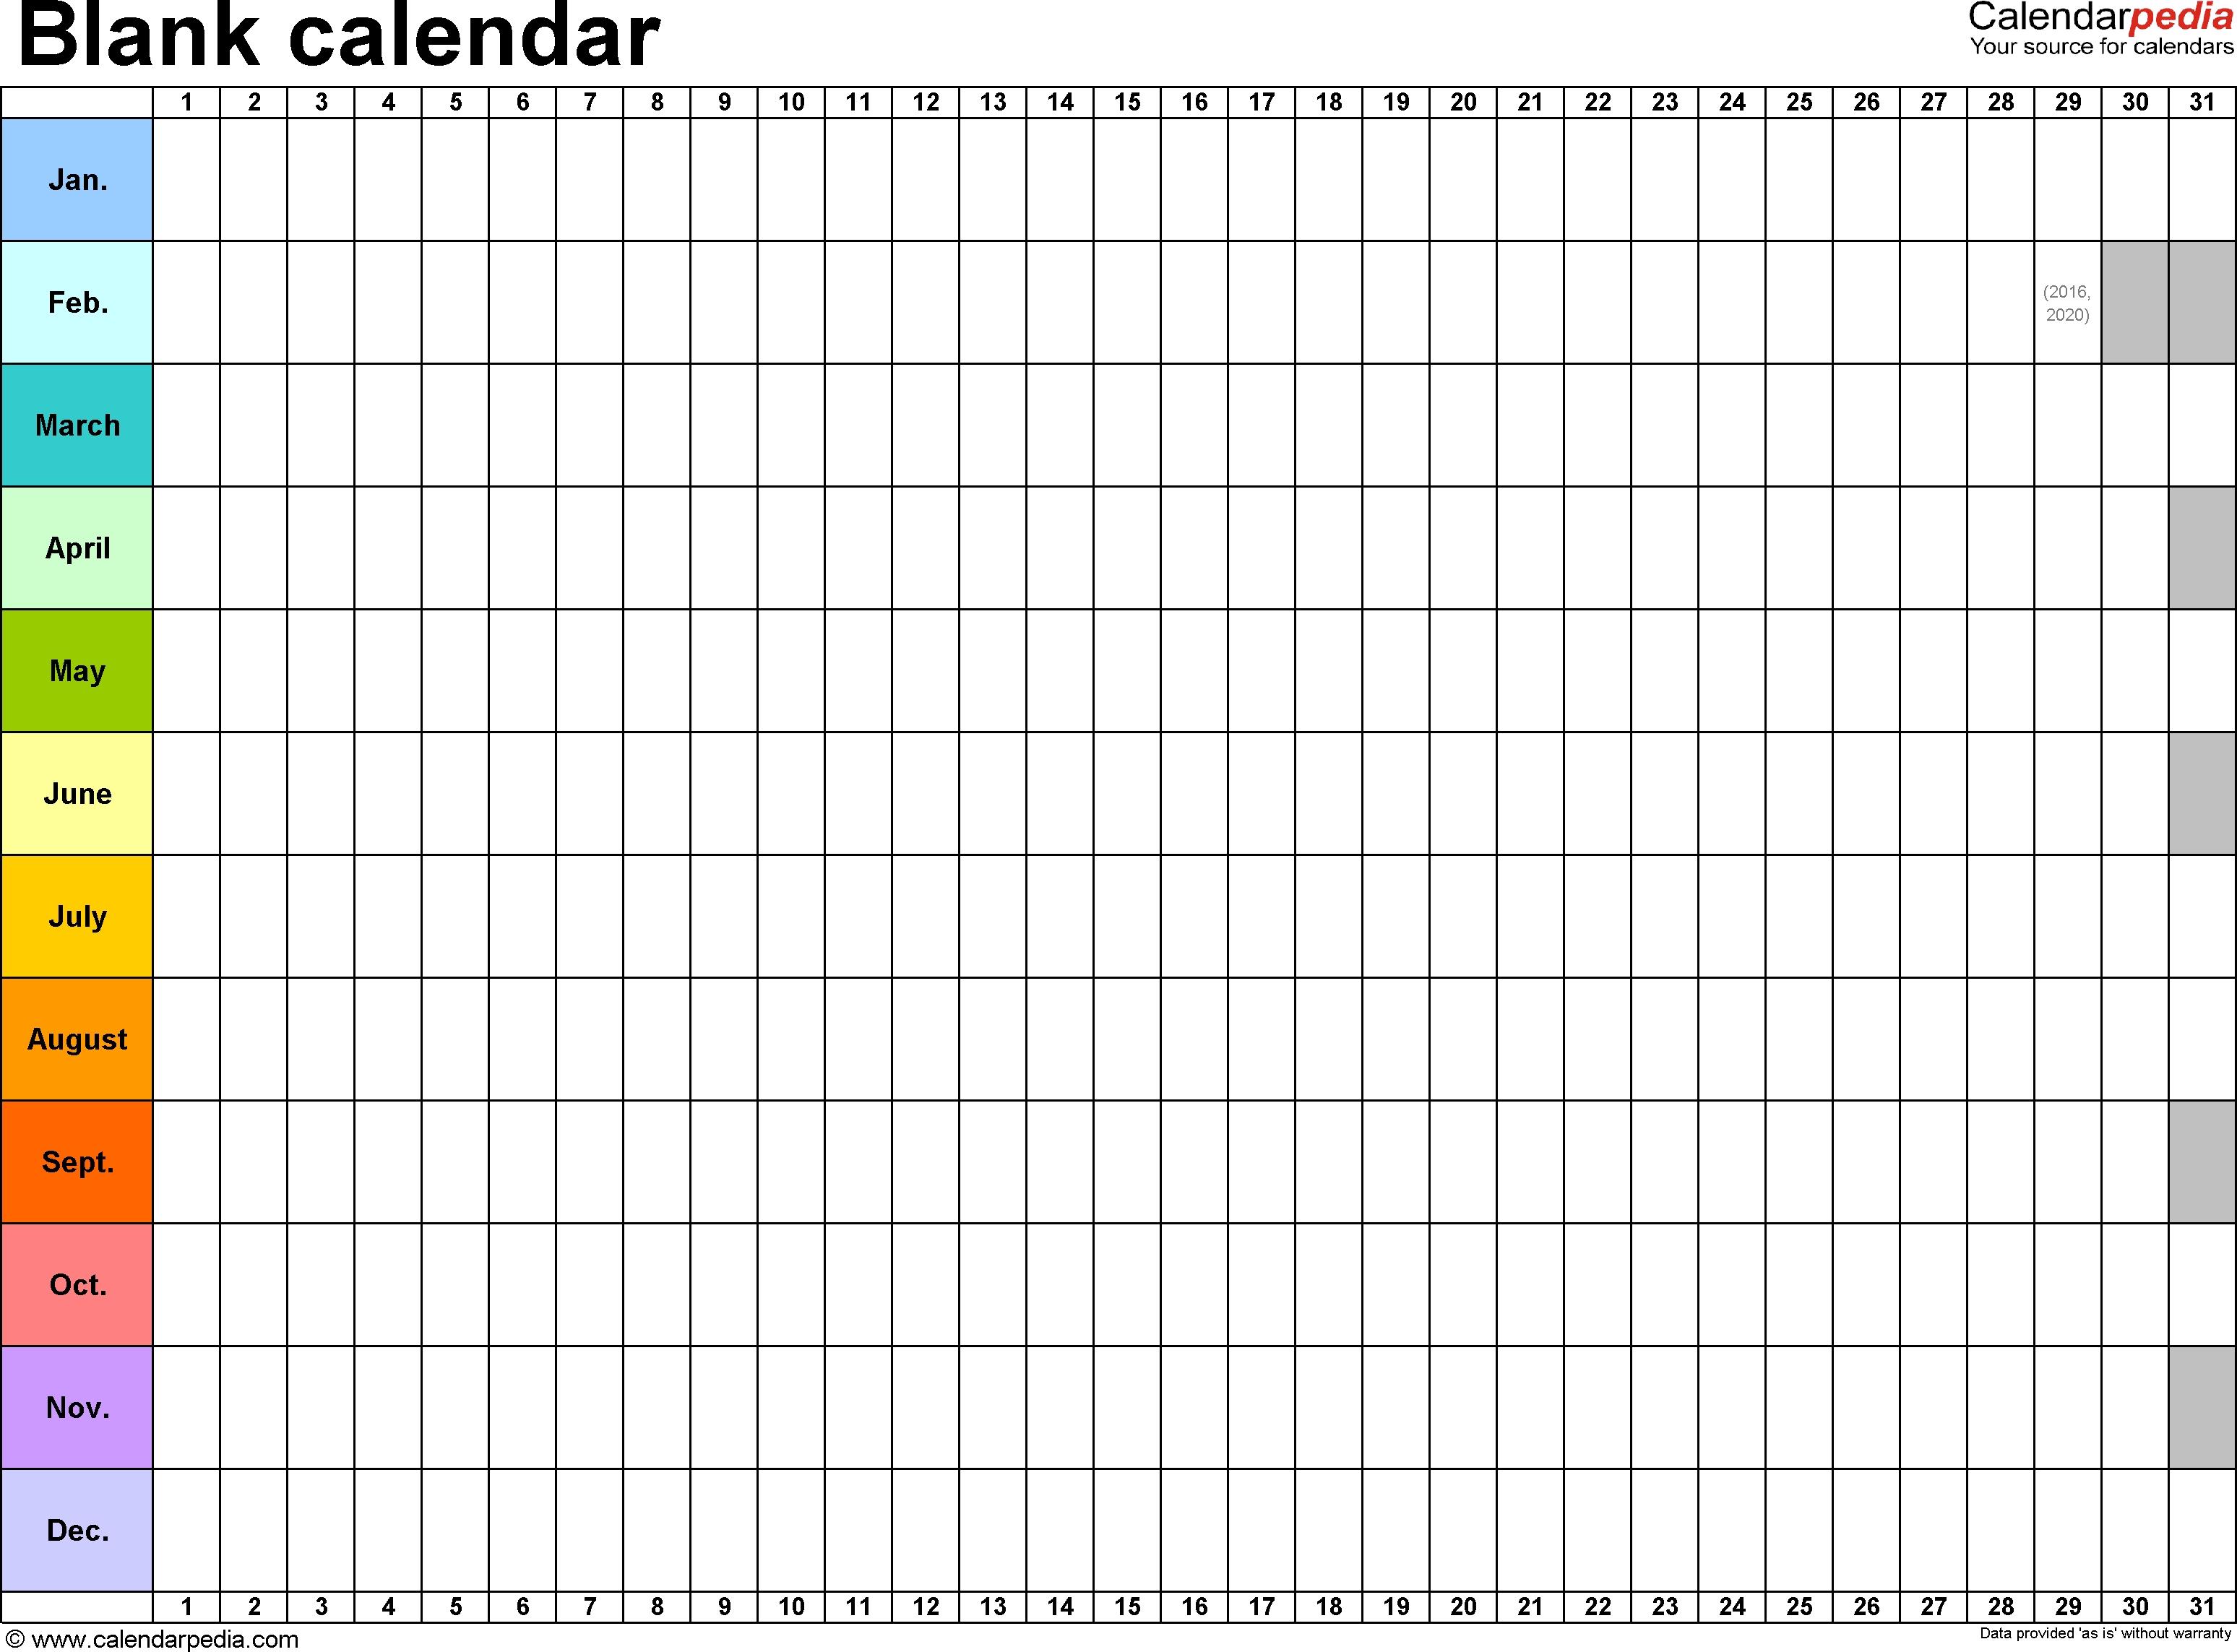 Blank Calendar - 9 Free Printable Microsoft Word Templates inside 3 Month Printable Calendar Template